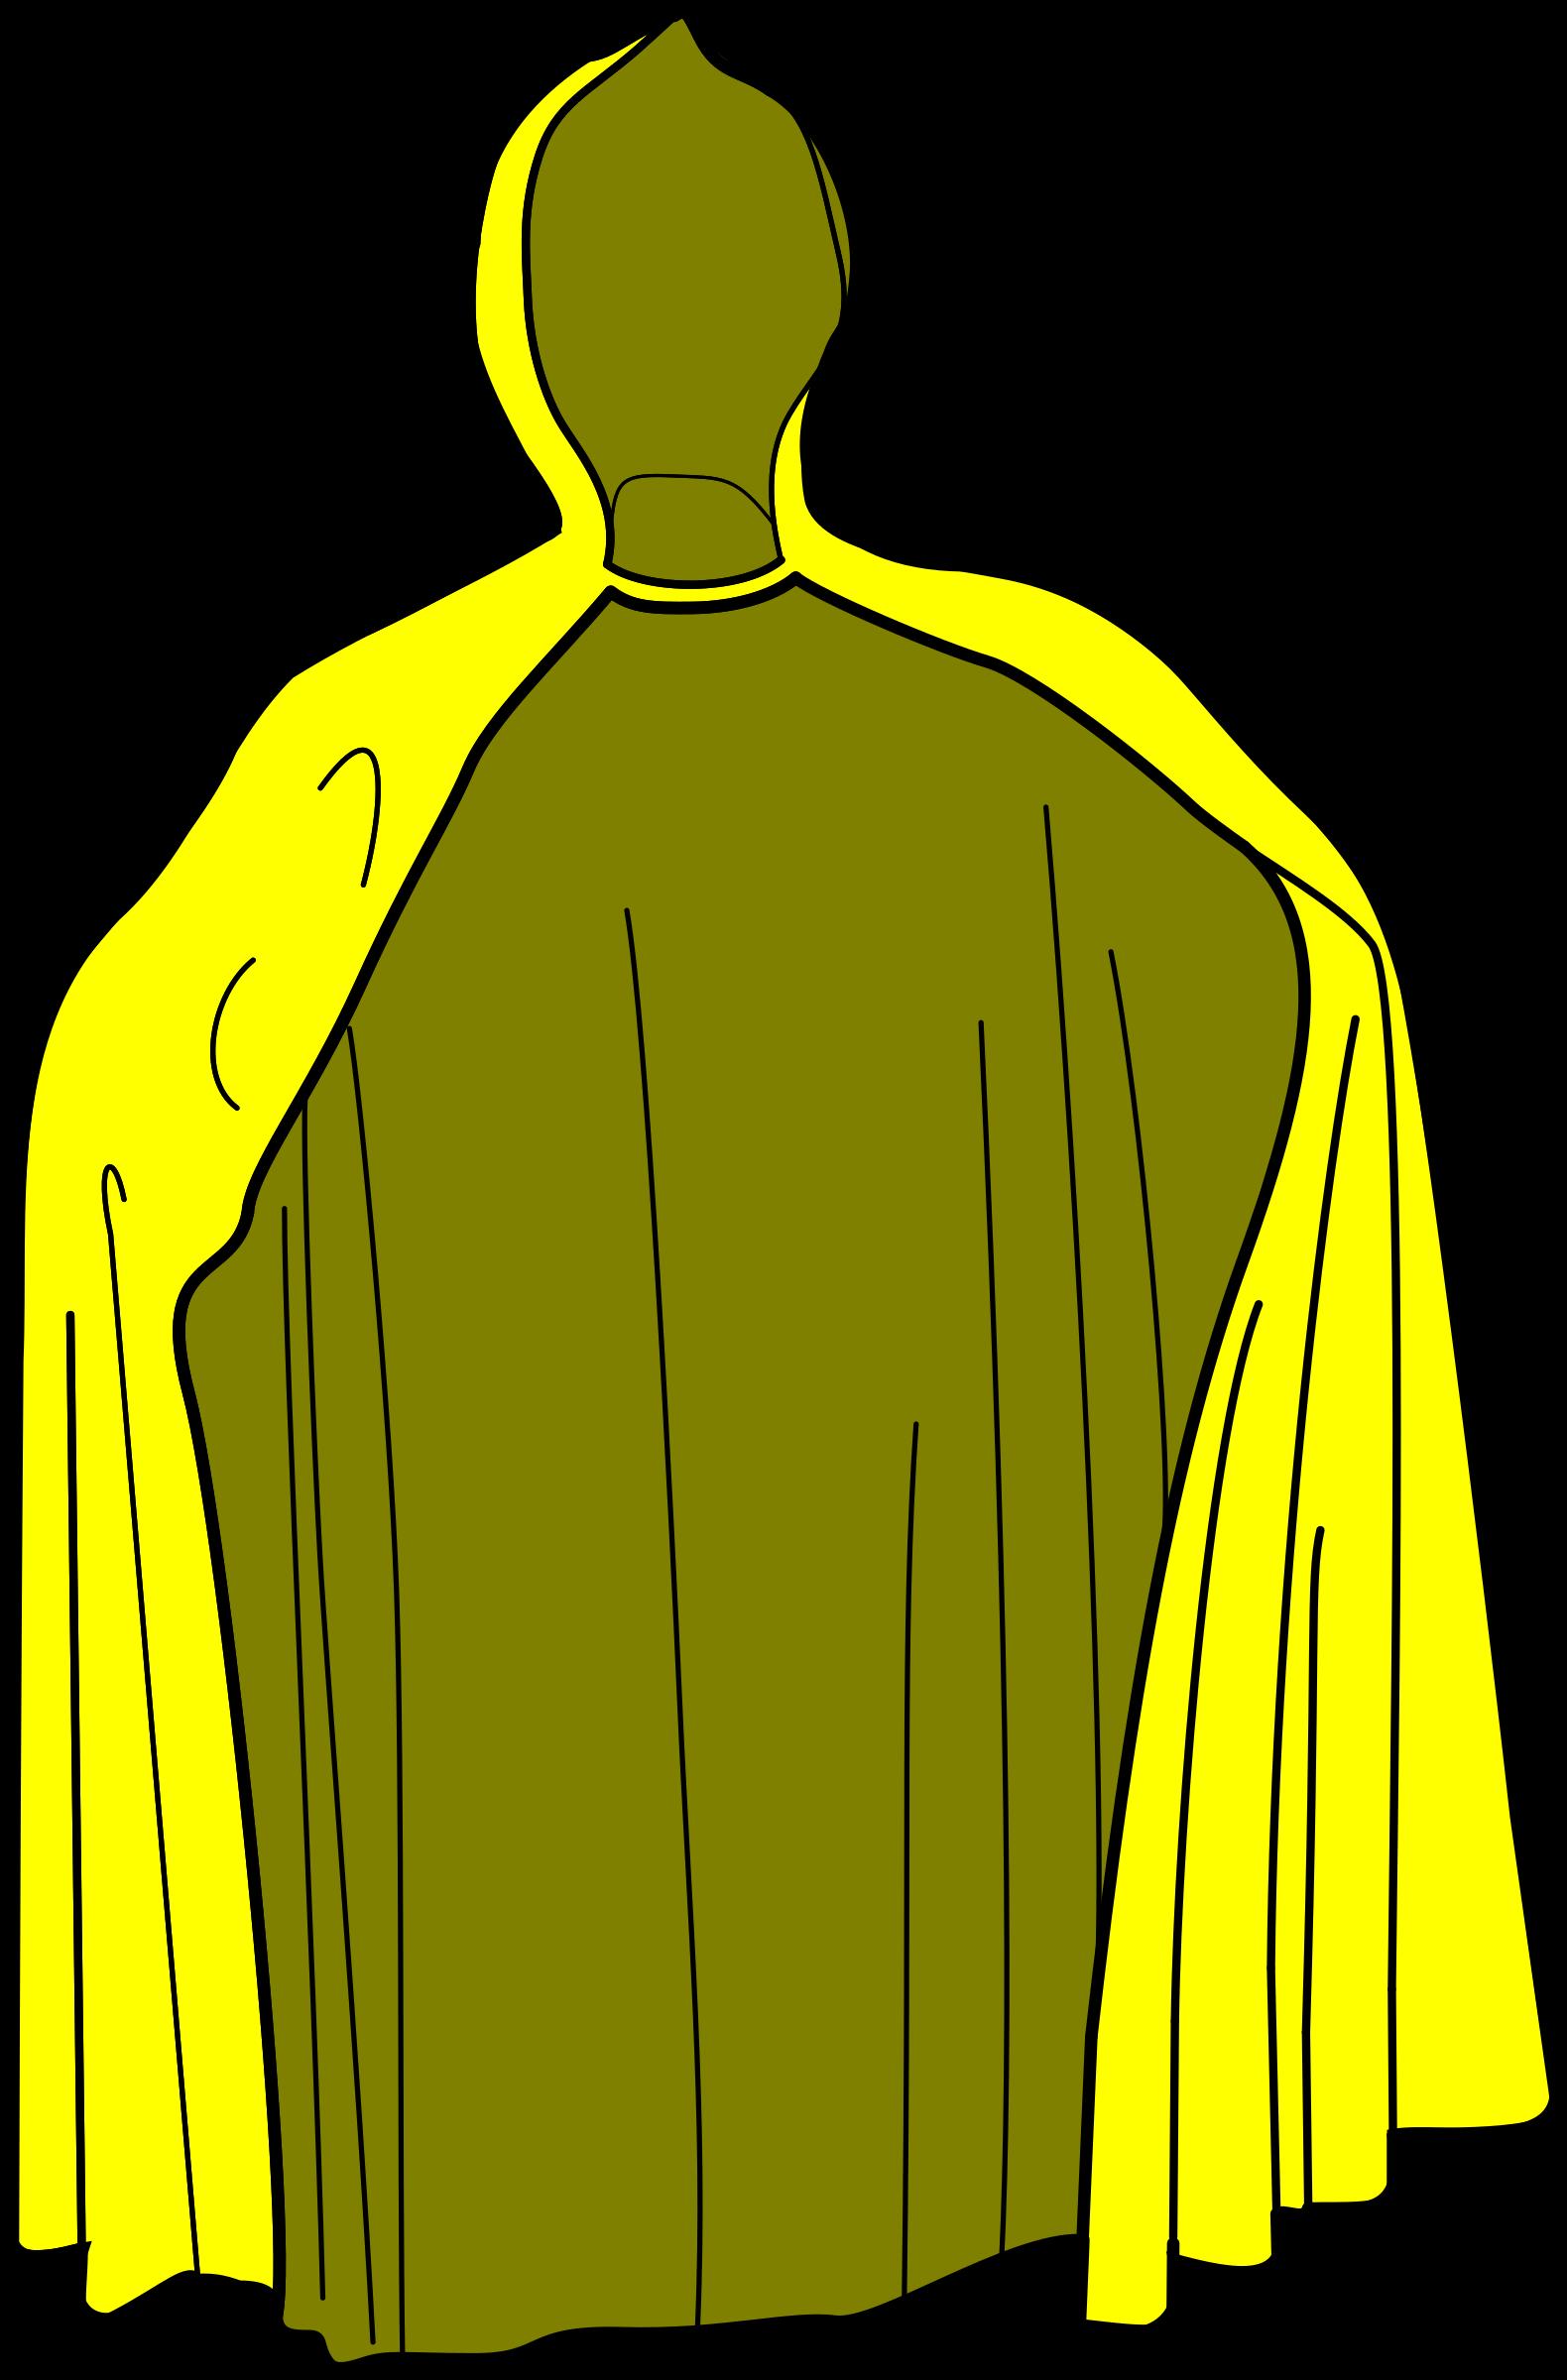 1580x2400 Coat Clipart Rain Gear